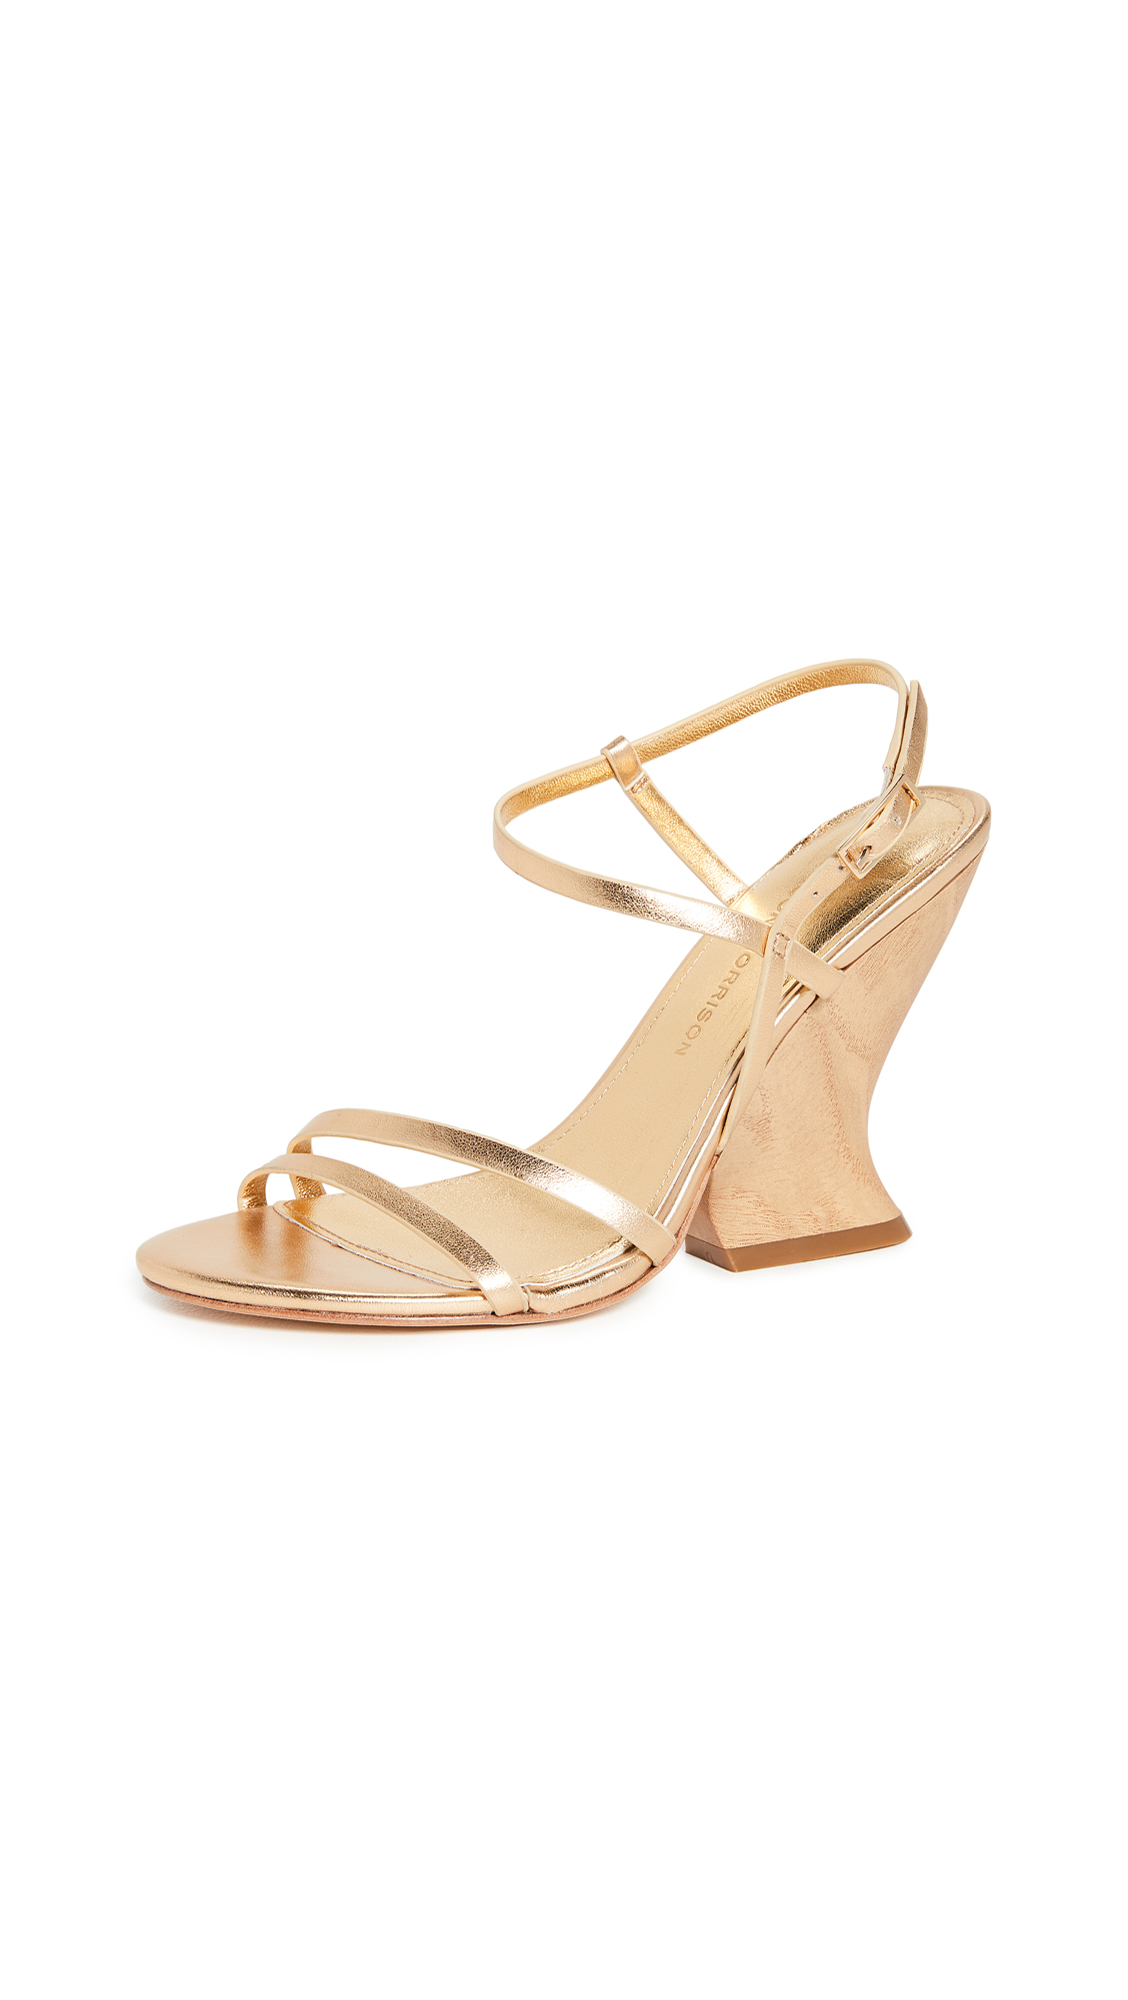 Buy Sigerson Morrison Willa Wedge Sandals online, shop Sigerson Morrison